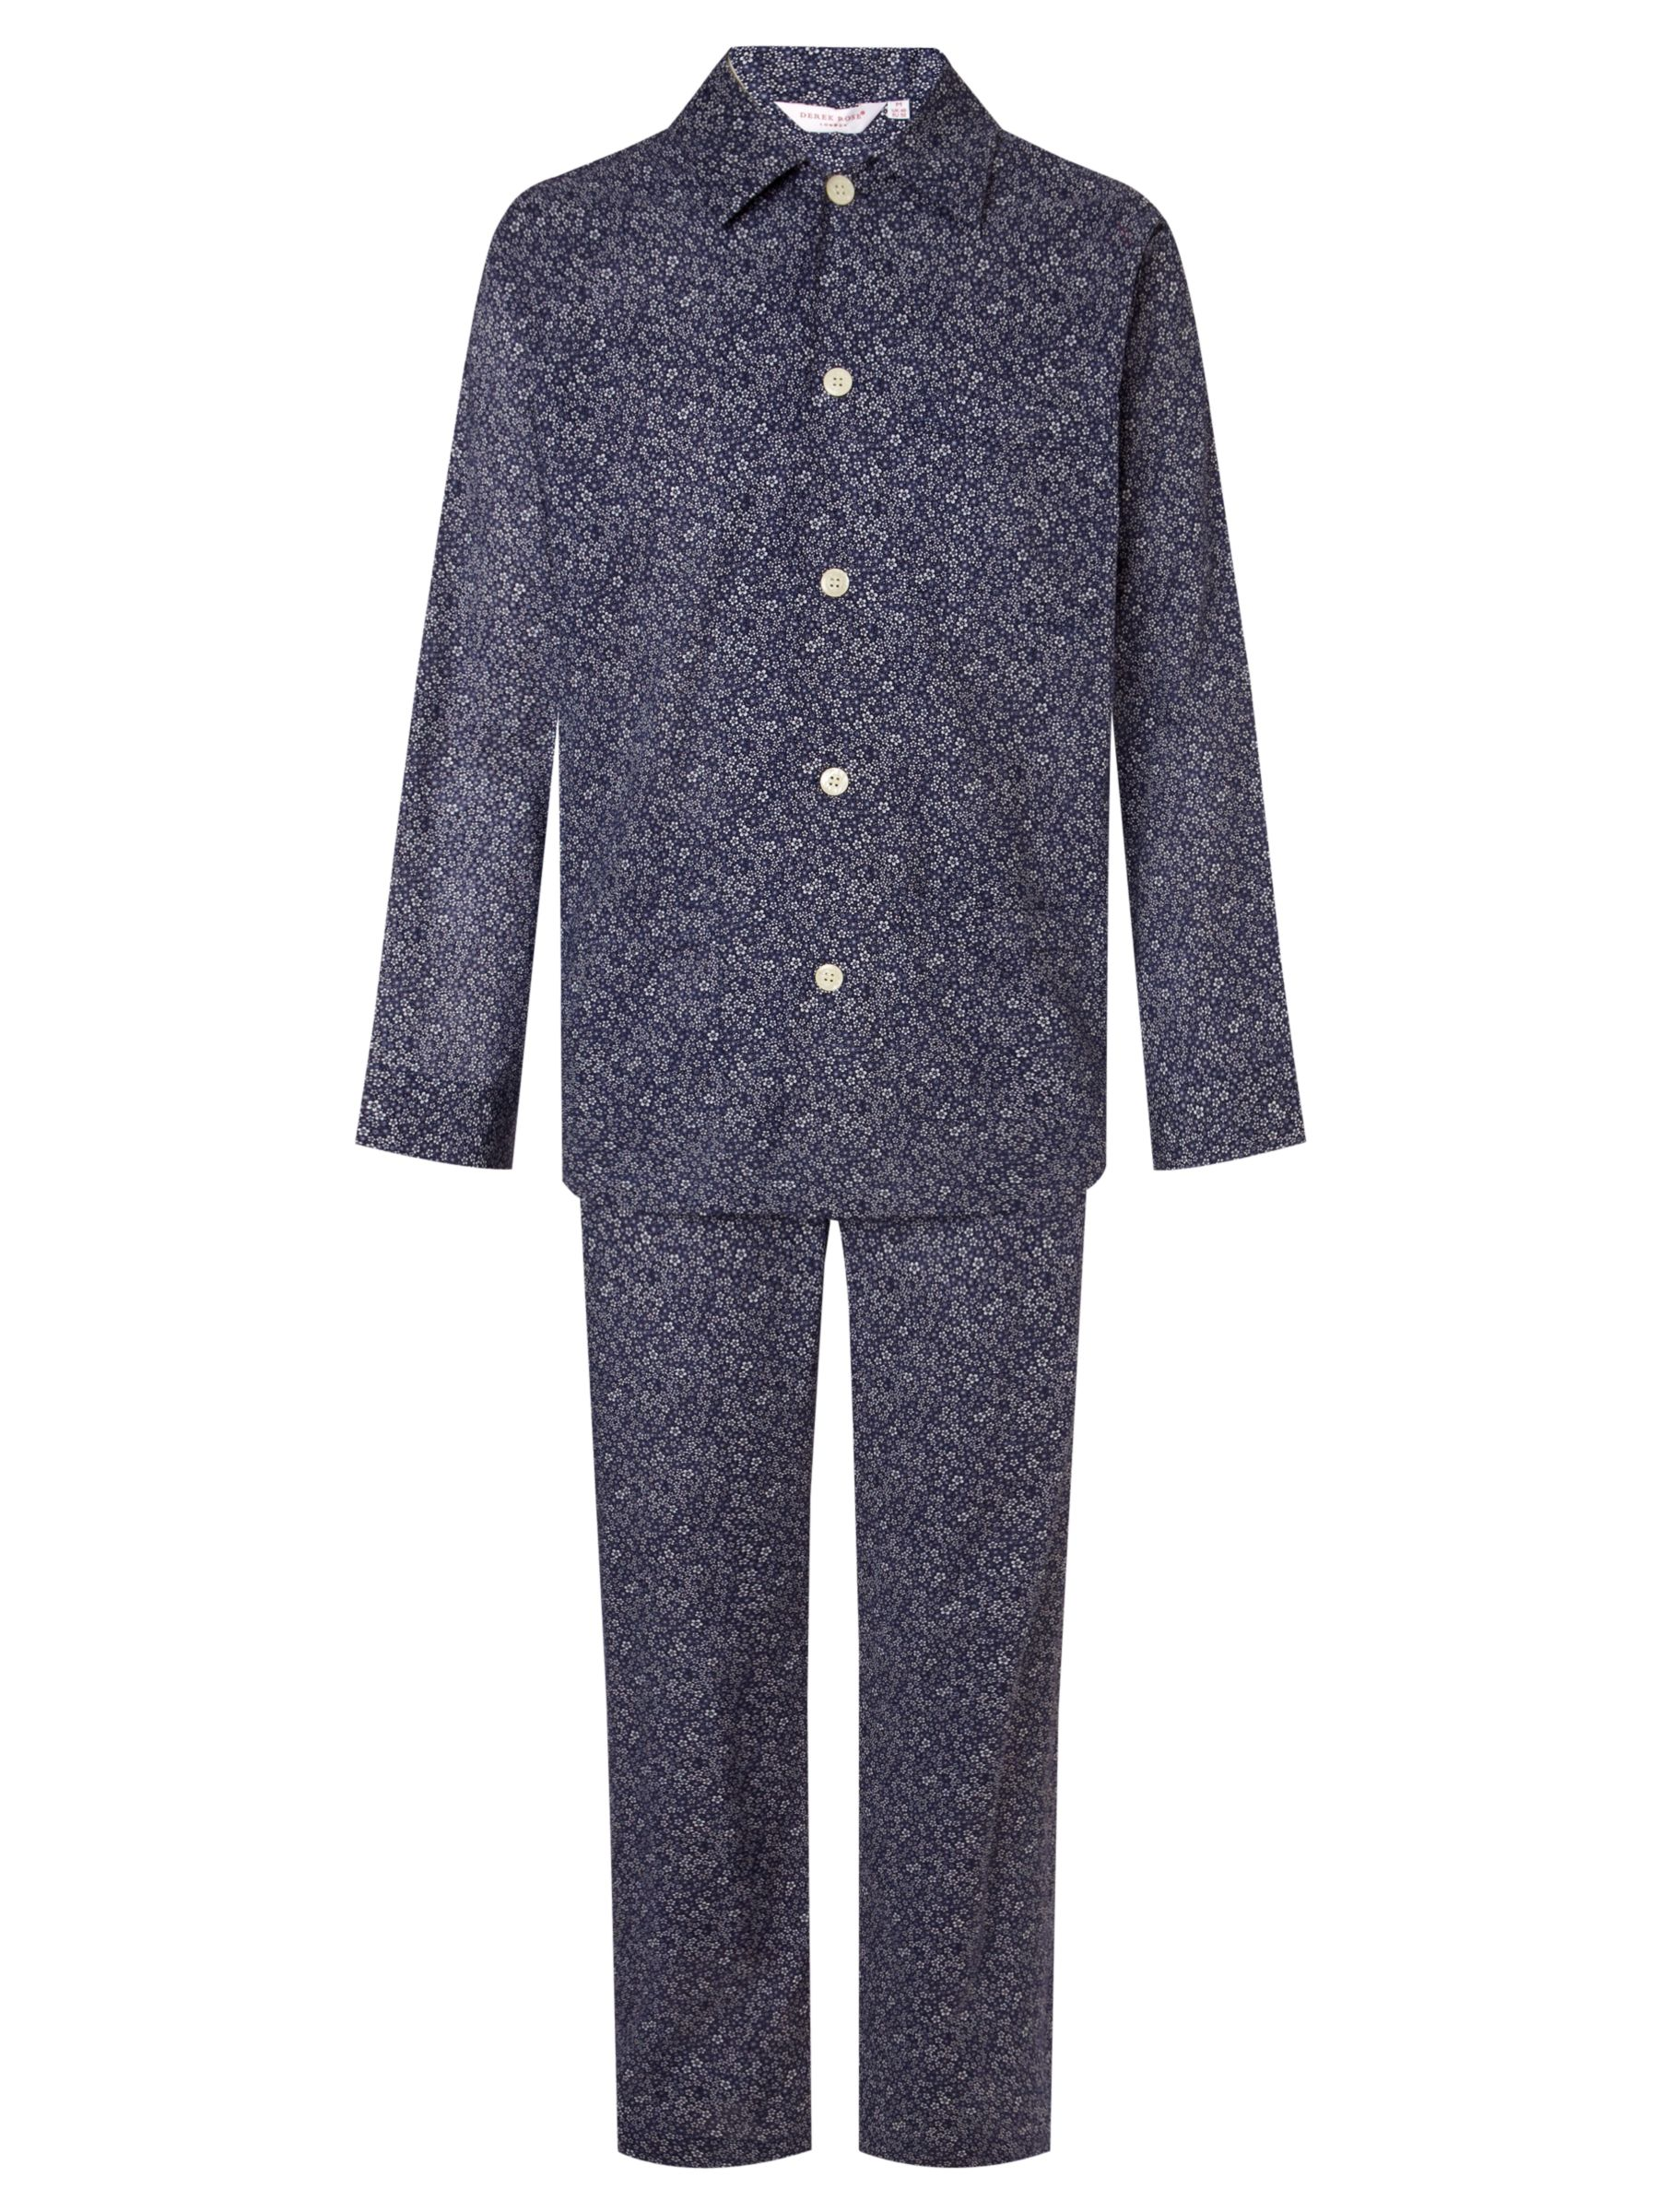 Derek Rose Dixie Floral Print Pyjamas, Blue